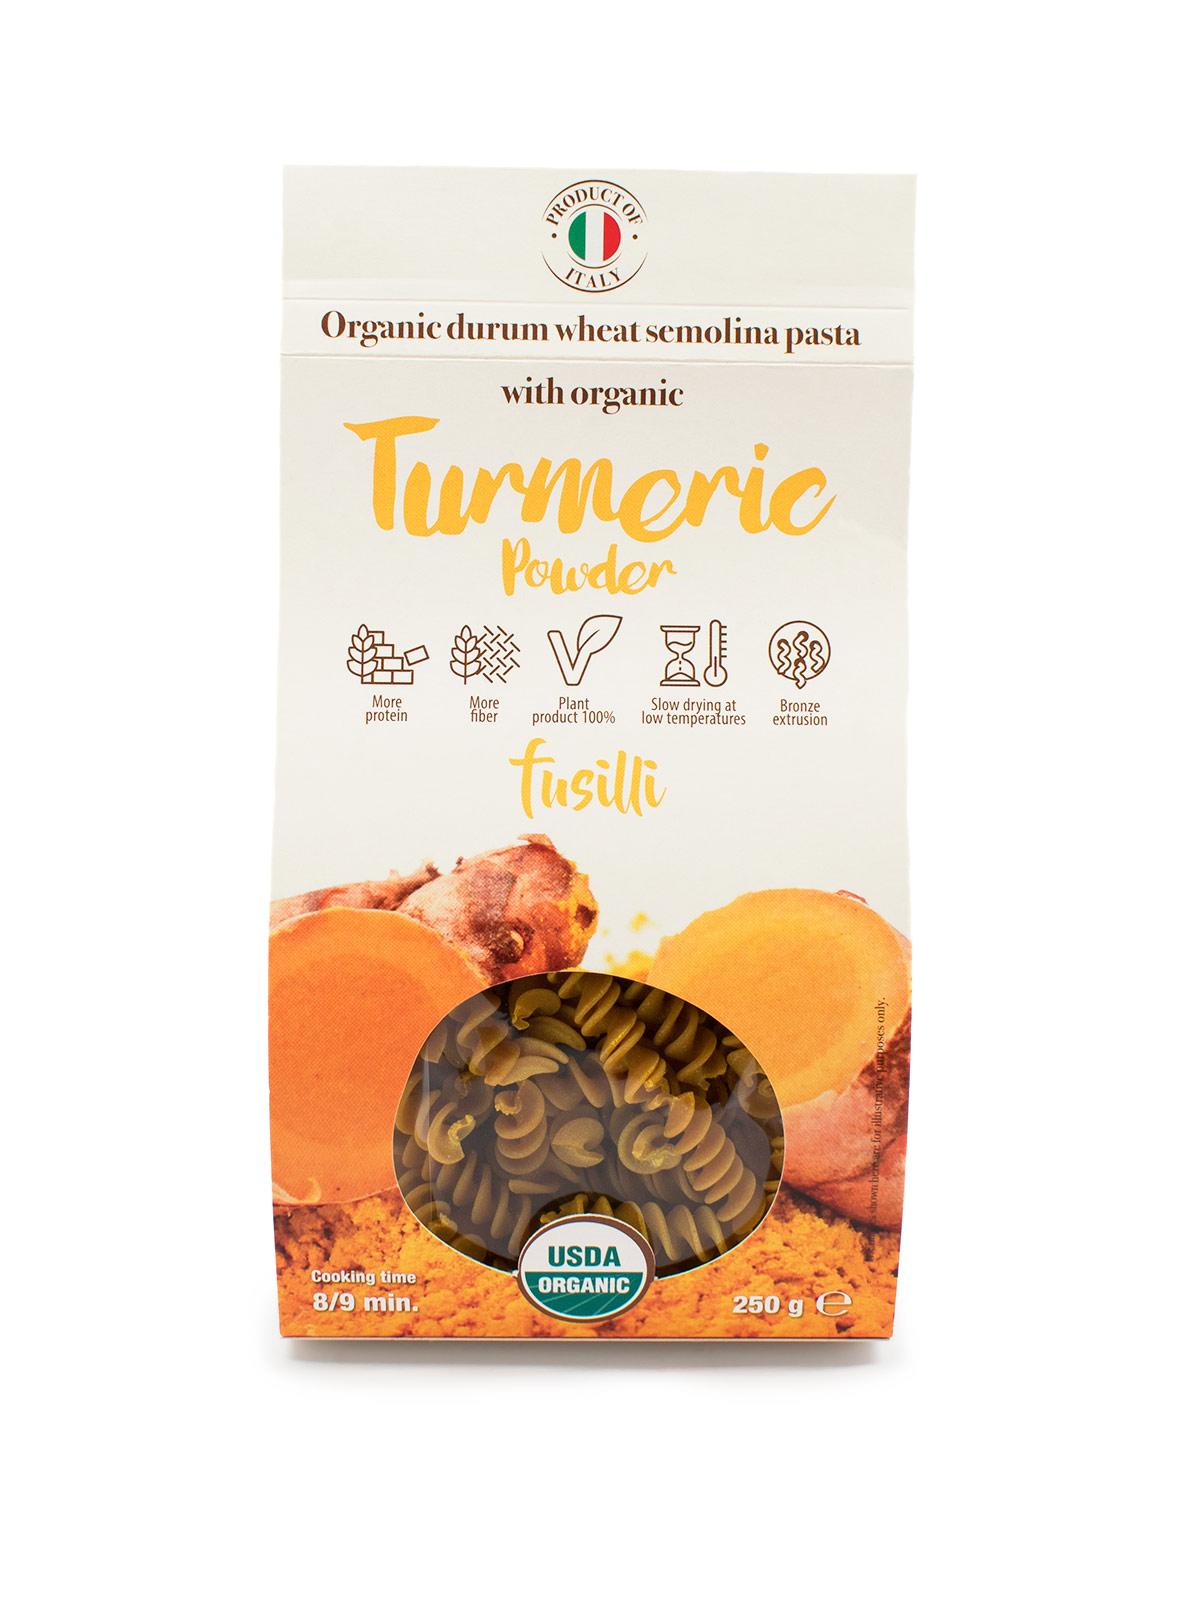 Fusilli with Organic Turmeric Powder - Pastas, Rice, and Grains - Buon'Italia